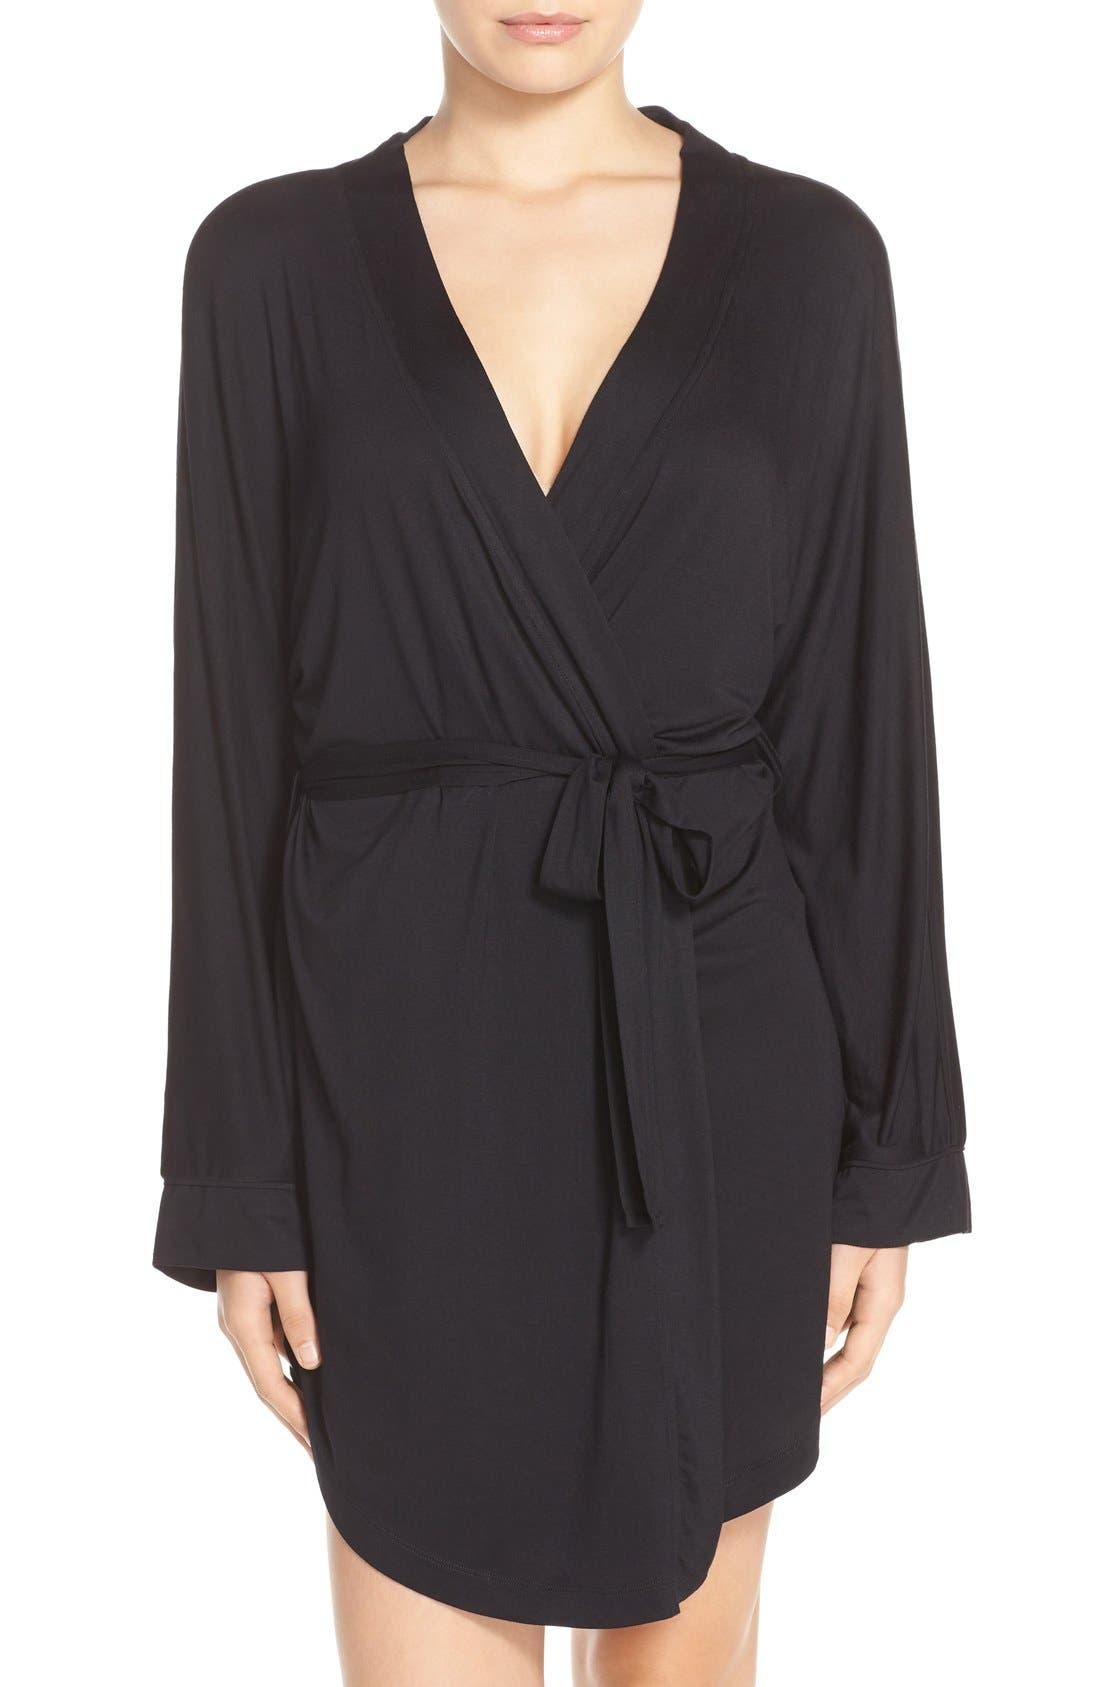 HONEYDEW INTIMATES, All American Jersey Robe, Main thumbnail 1, color, BLACK